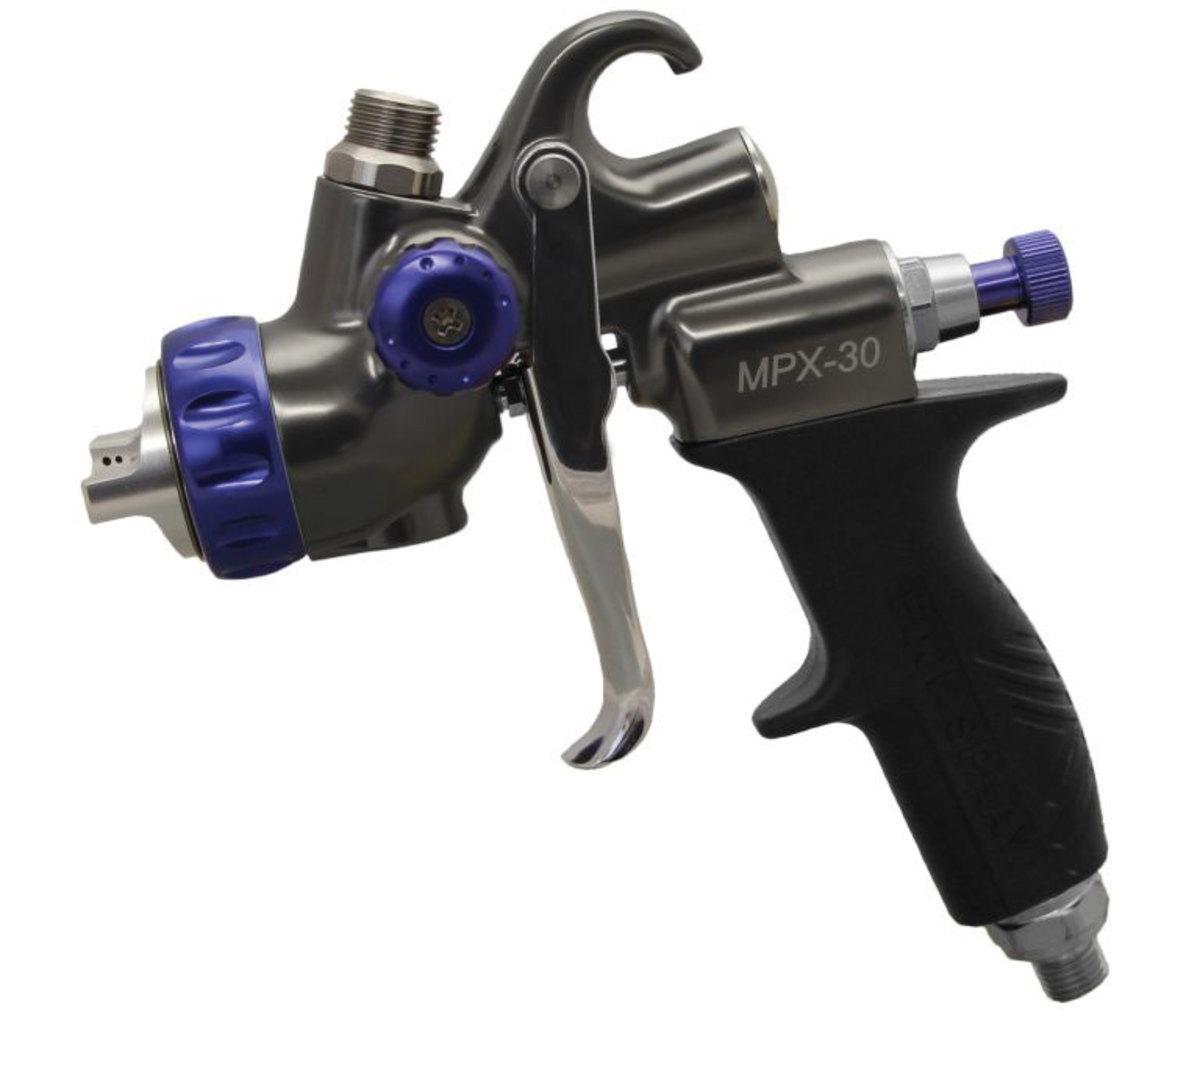 Fuji Spray's MPX-30